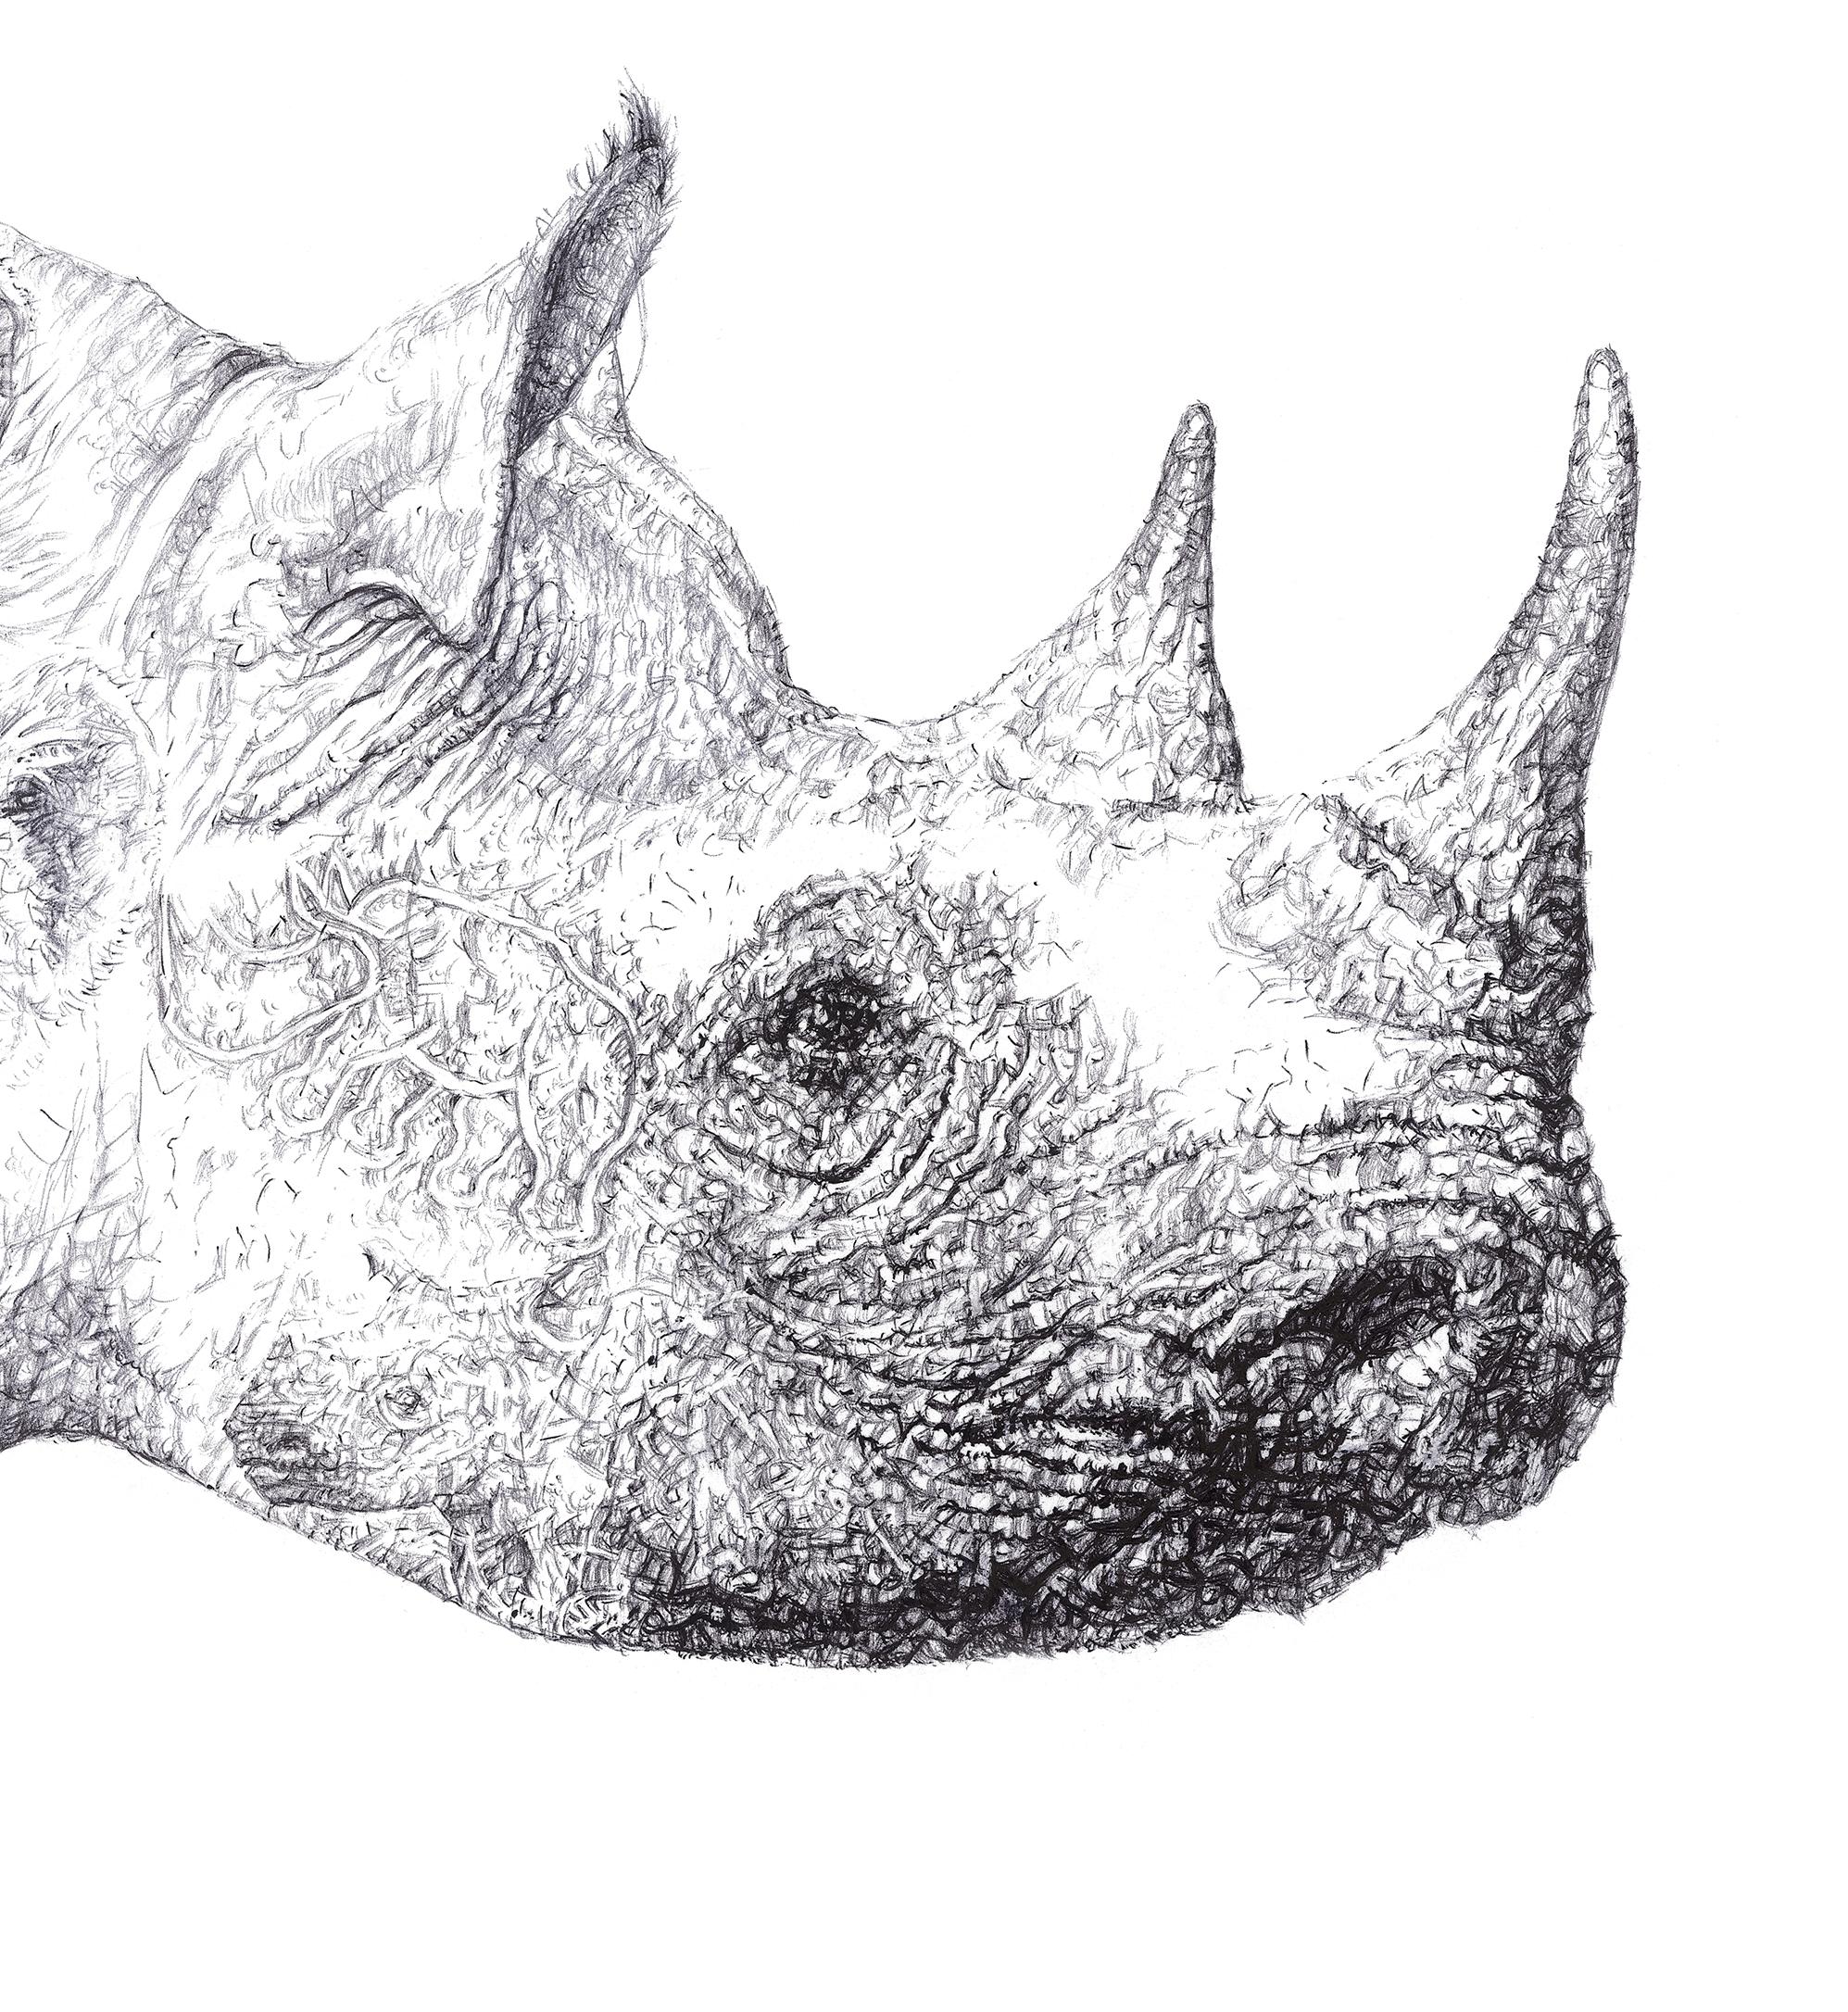 Drawn rhino face 'Rhino McCracken species Endangered detail